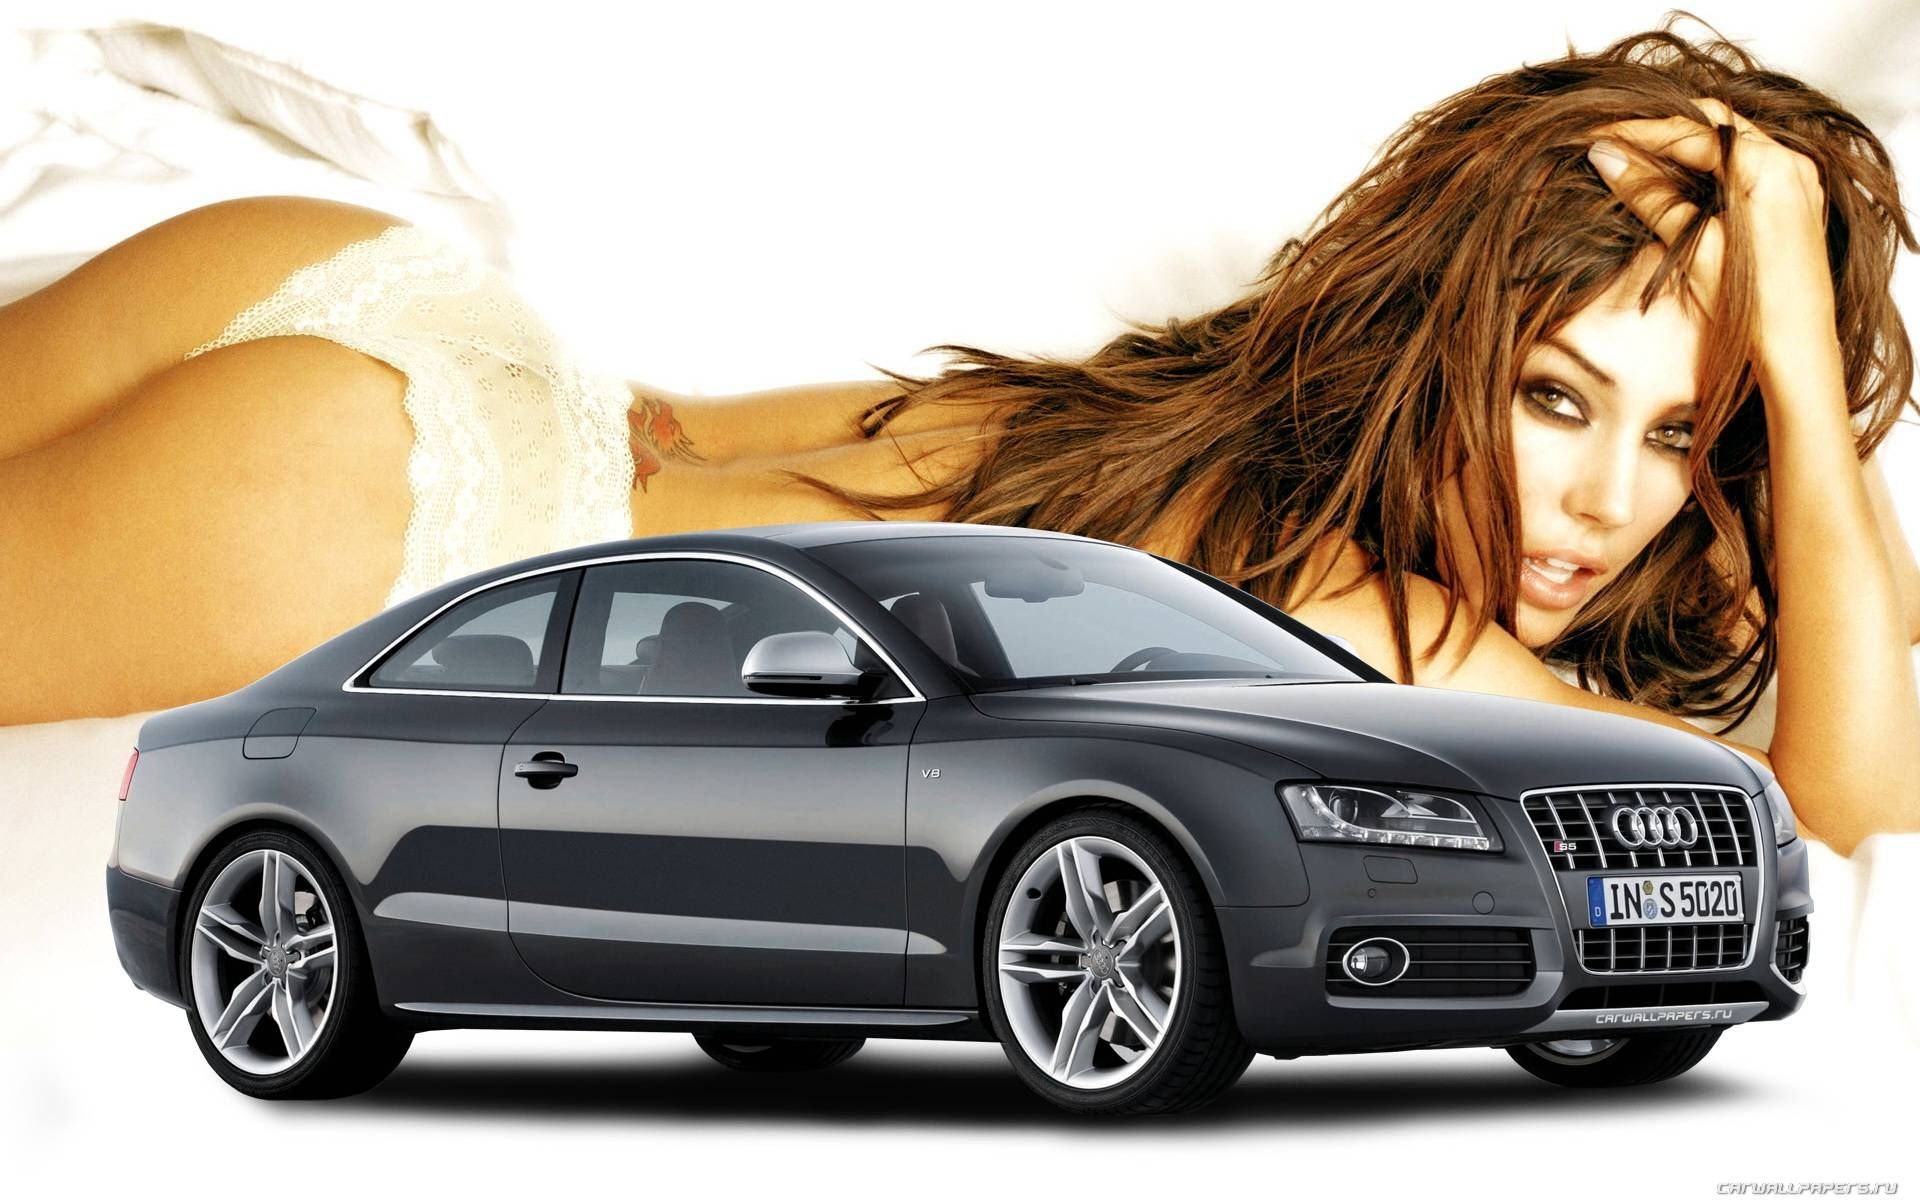 Audi S6 With Girl Jpg 1920 1200 Car Girls Car Wallpapers Audi S6